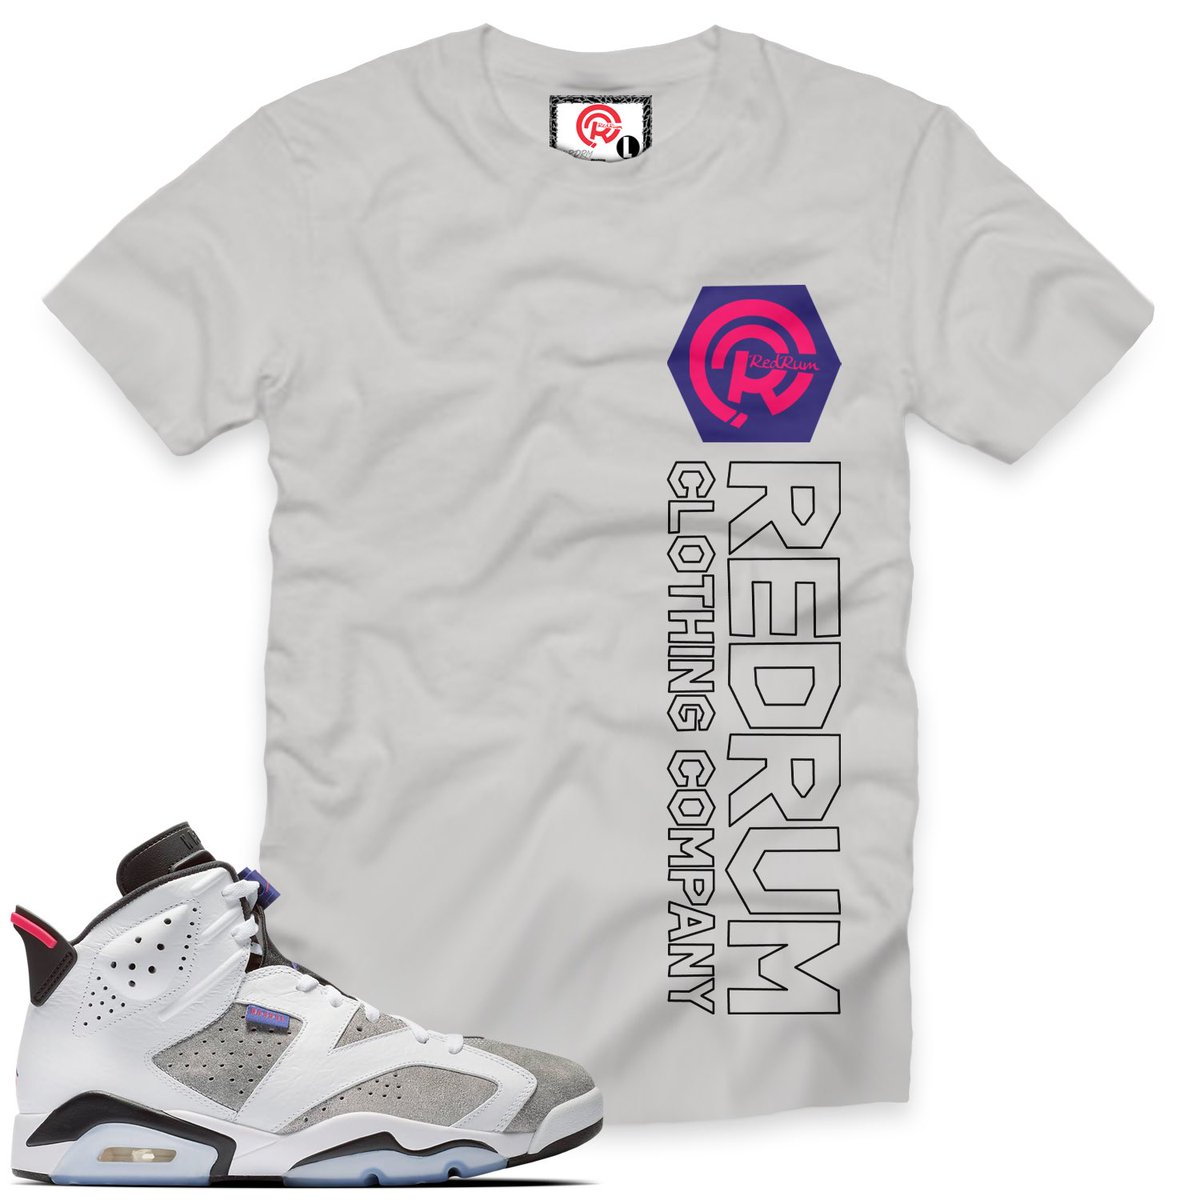 0bc2e49668bf30  RDRM Flint Grey 6 T-shirt For The  AJ6  FlintGrey  6s